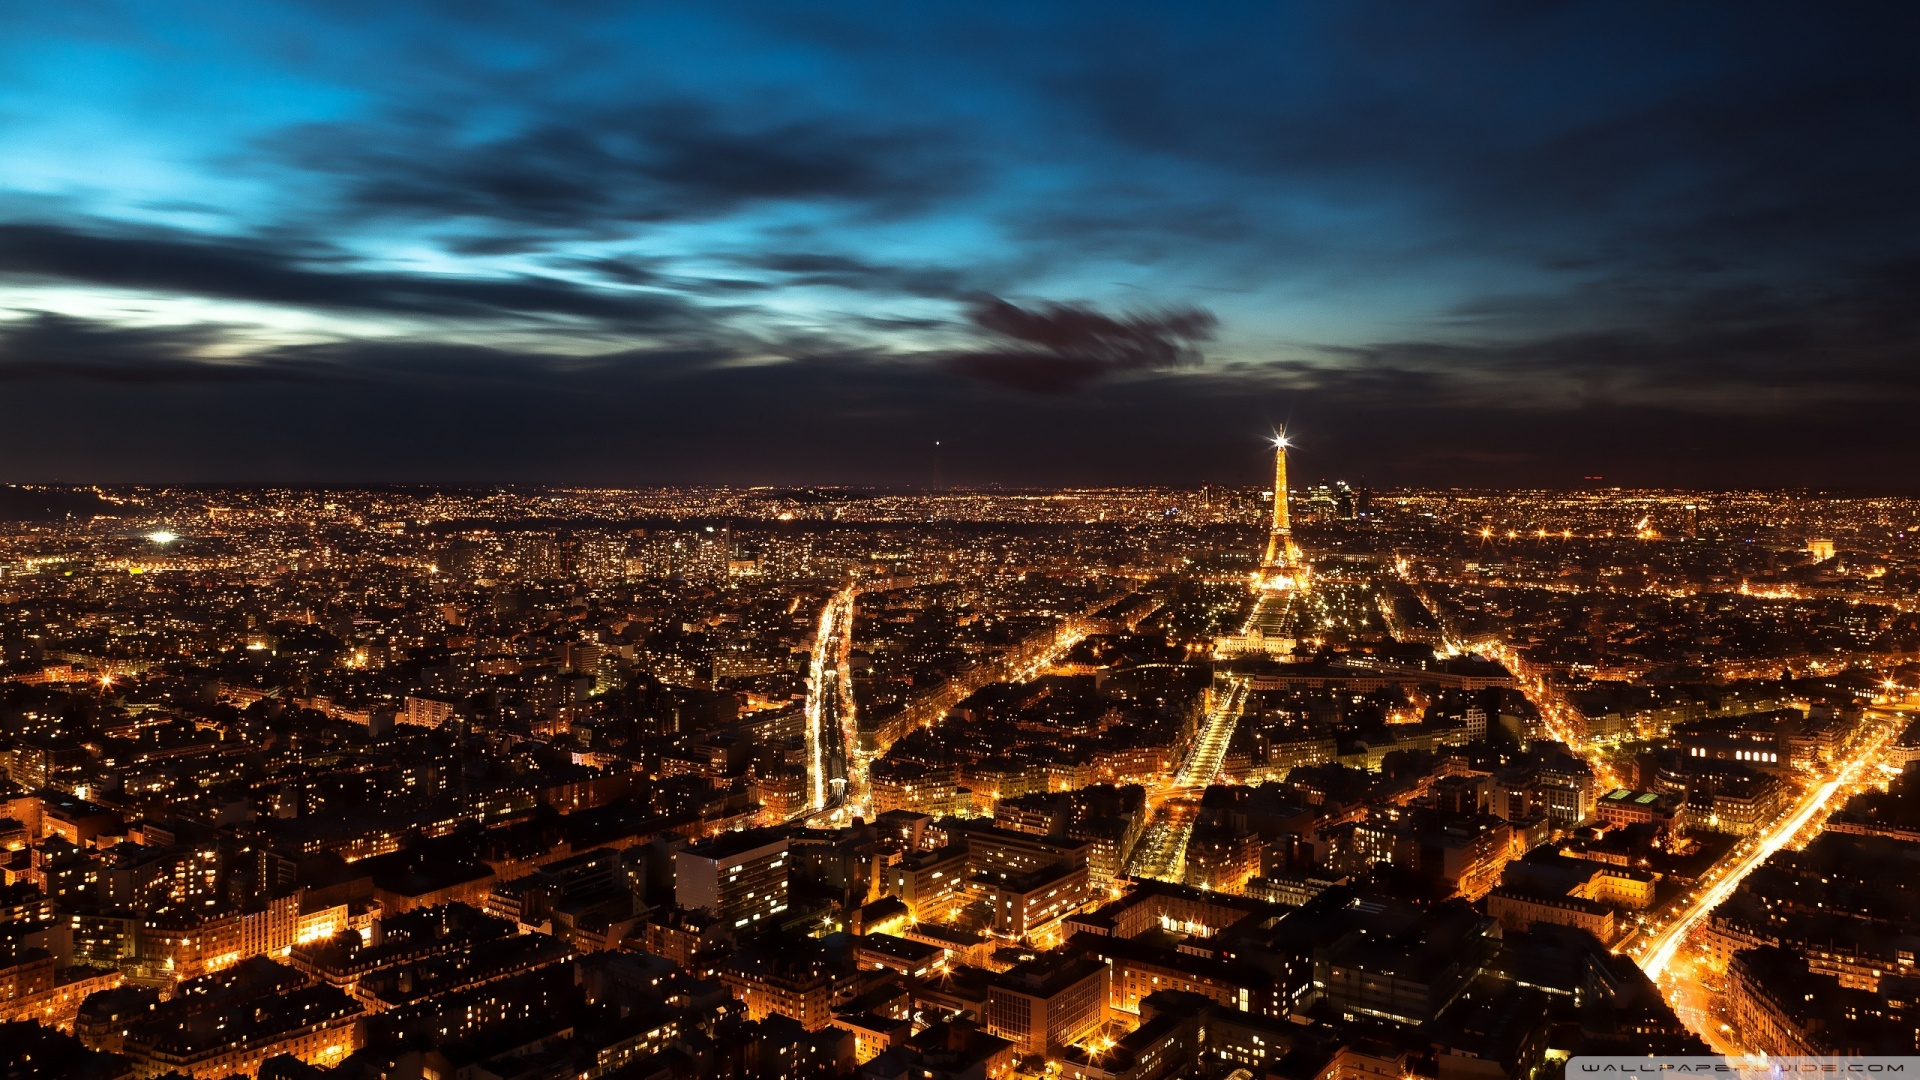 HD City Lights 24324 1920x1200 px